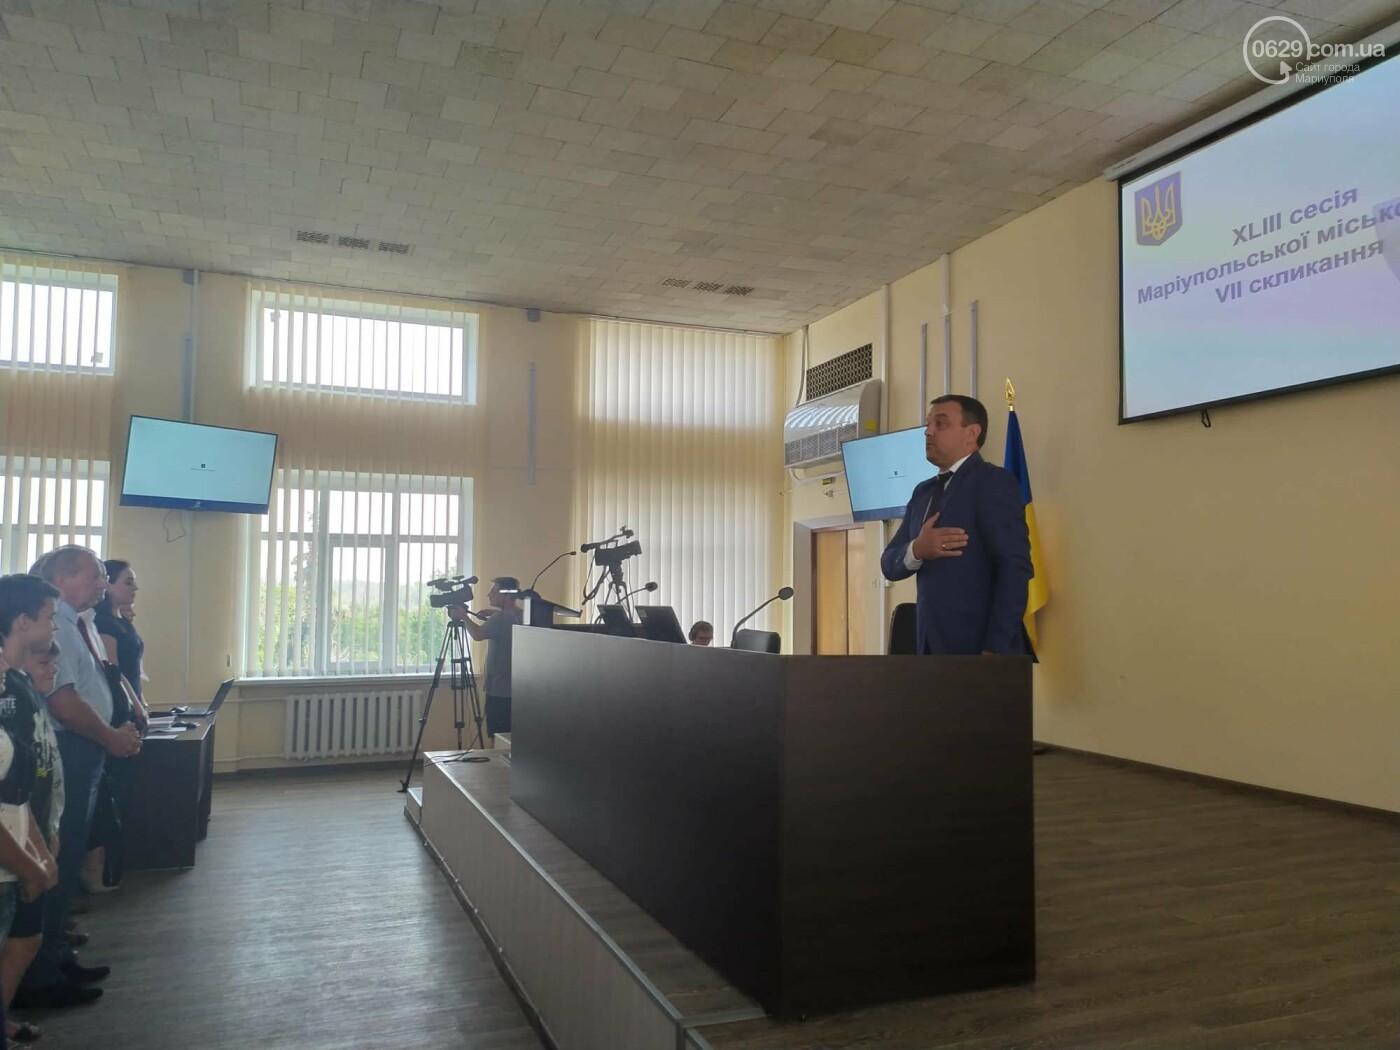 В Мариуполе стартовала сессия горсовета, - ФОТО, фото-1